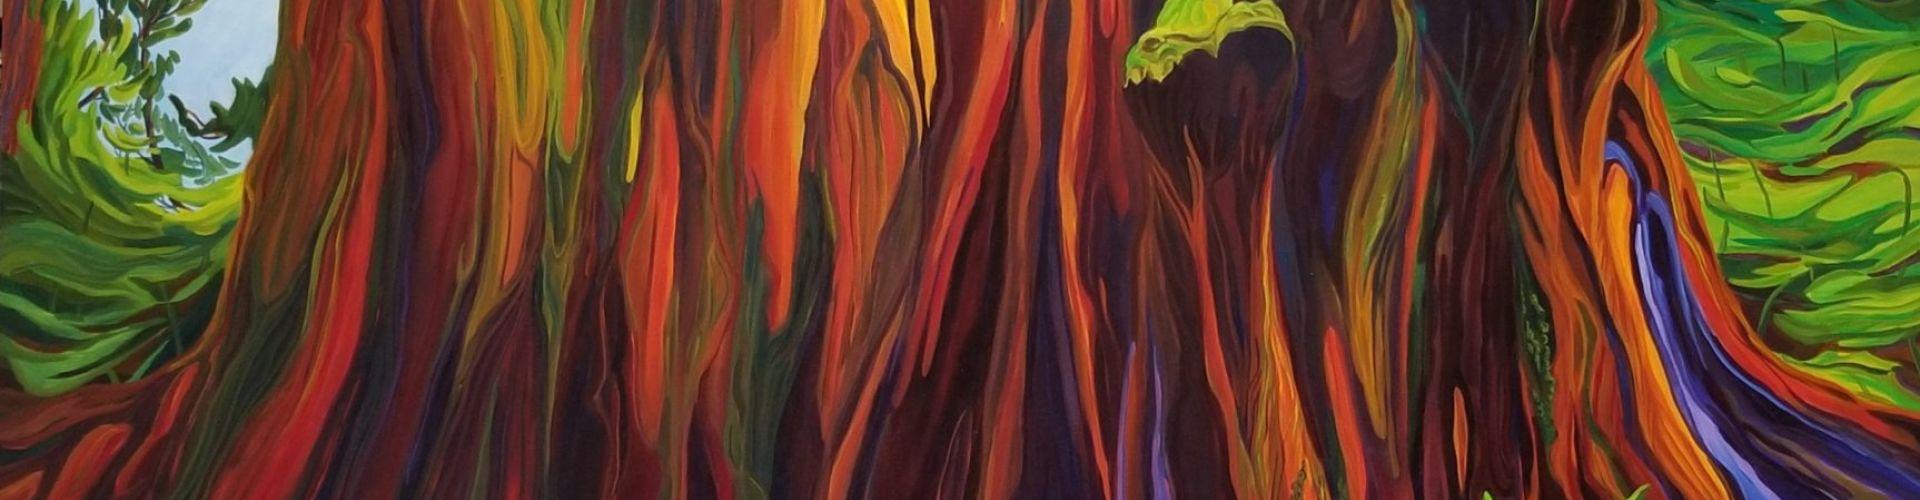 Majestic Wonder painting by Linda Lovisa